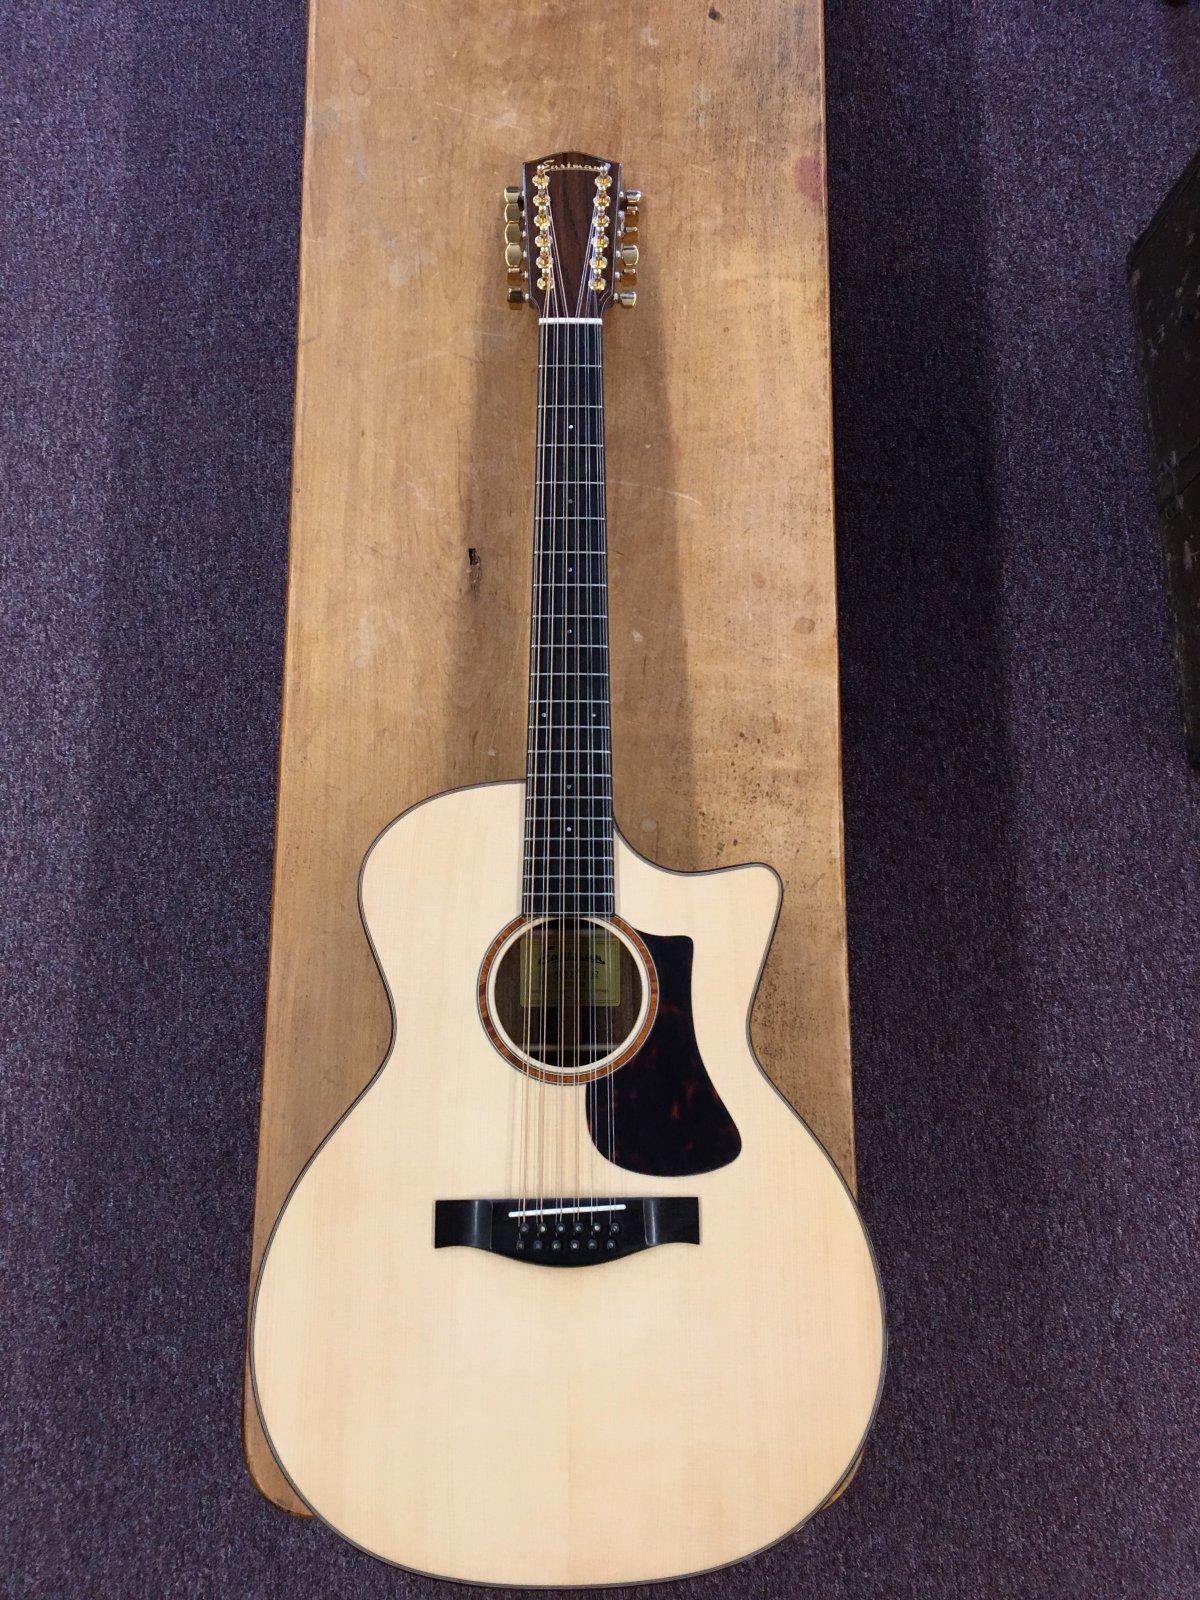 Eastman Grand Auditorium AC522CE-12 12 String Acoustic Guitar